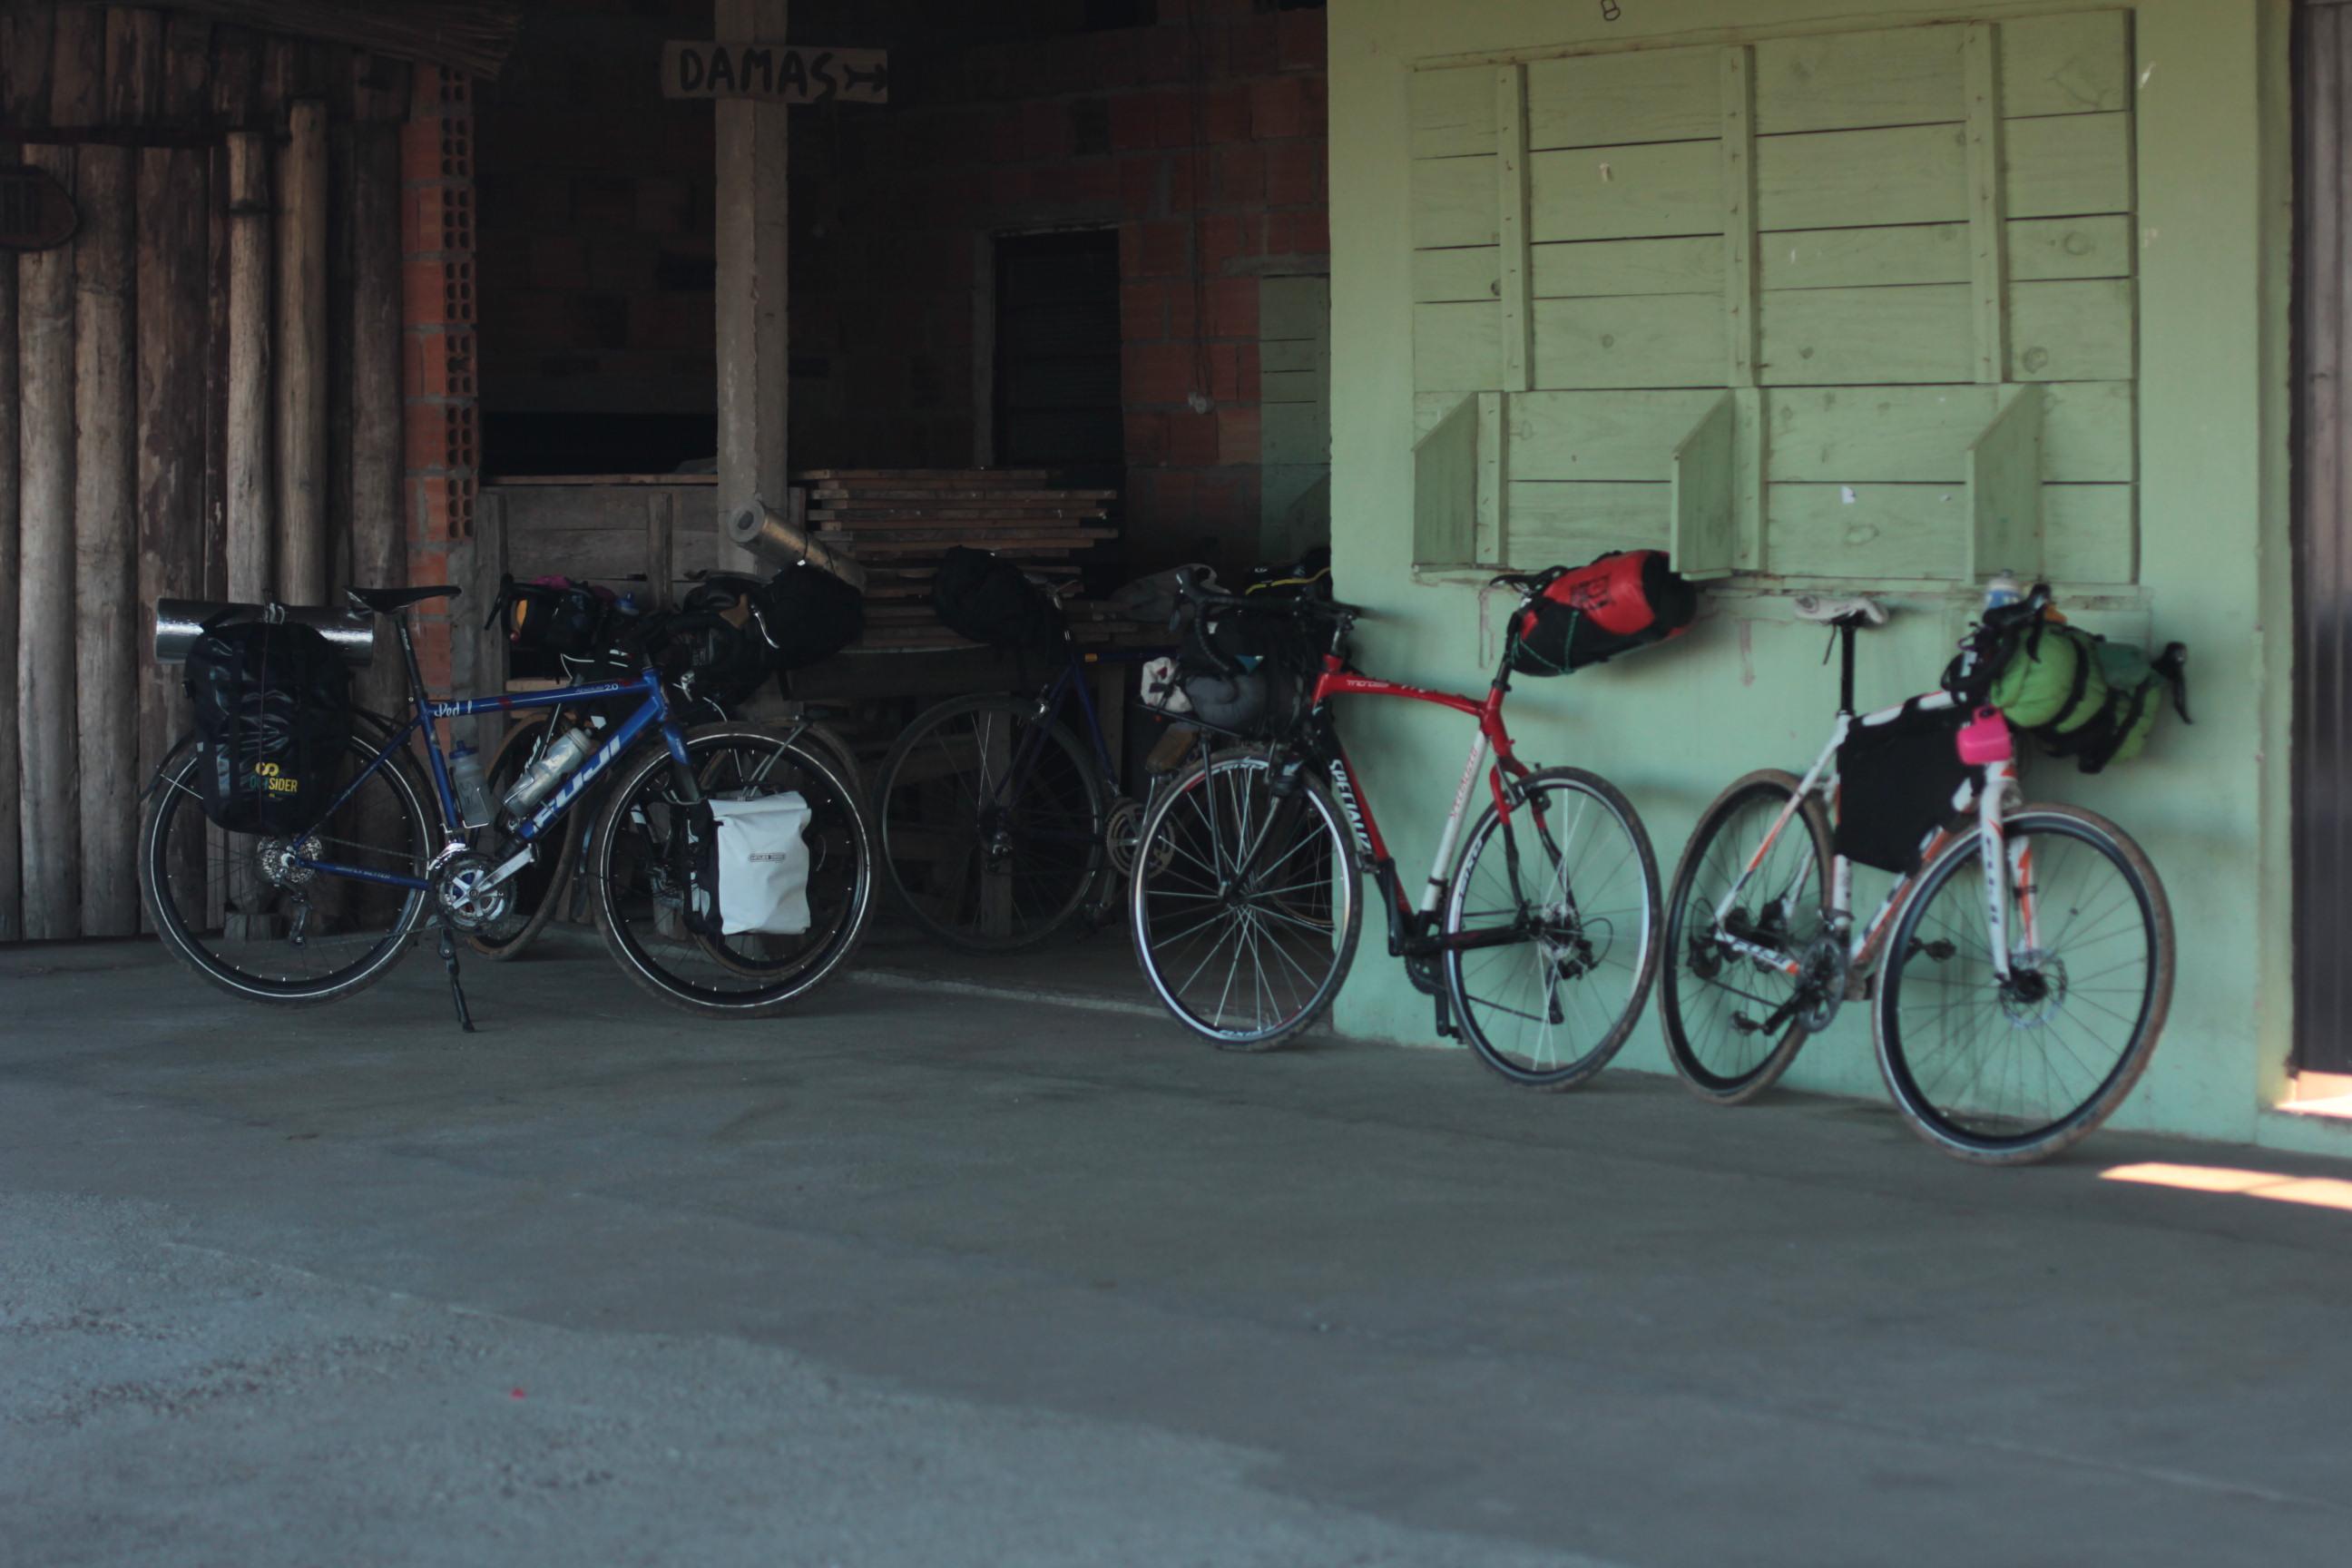 05-expresso-patagonia-porto-alegre-sao-gabriel-bike-packing